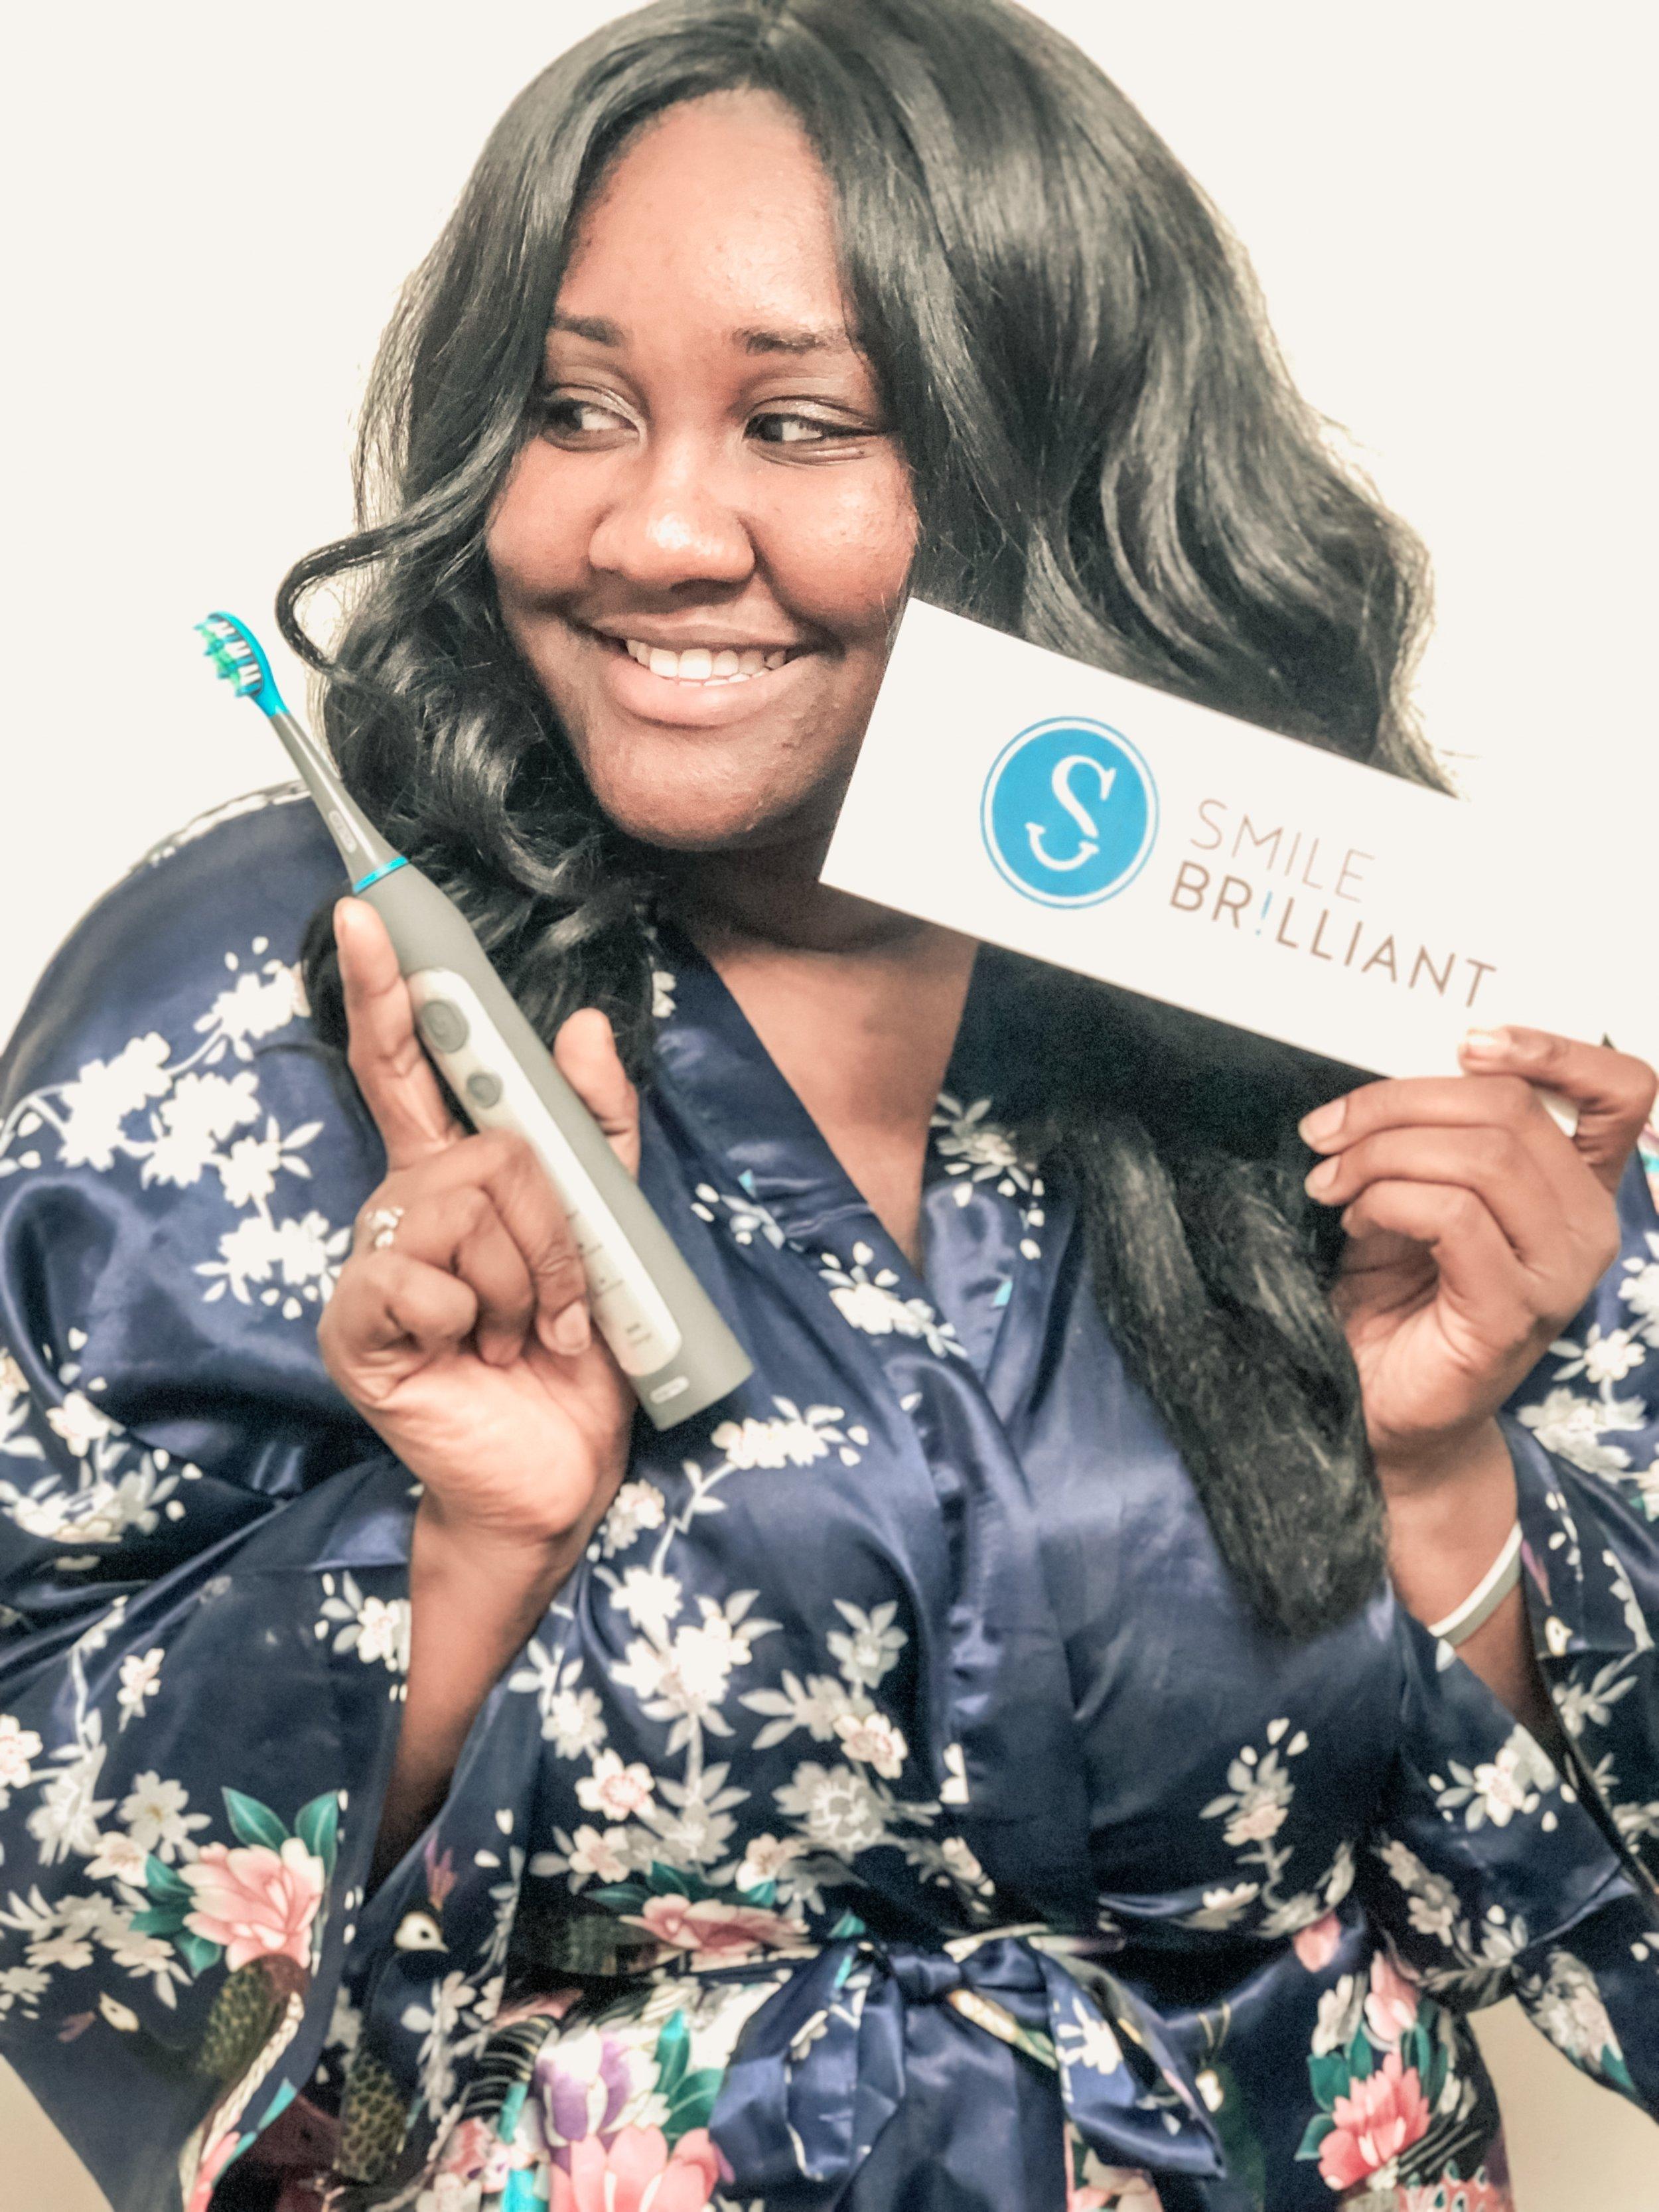 Smile Brilliant Giveaway -